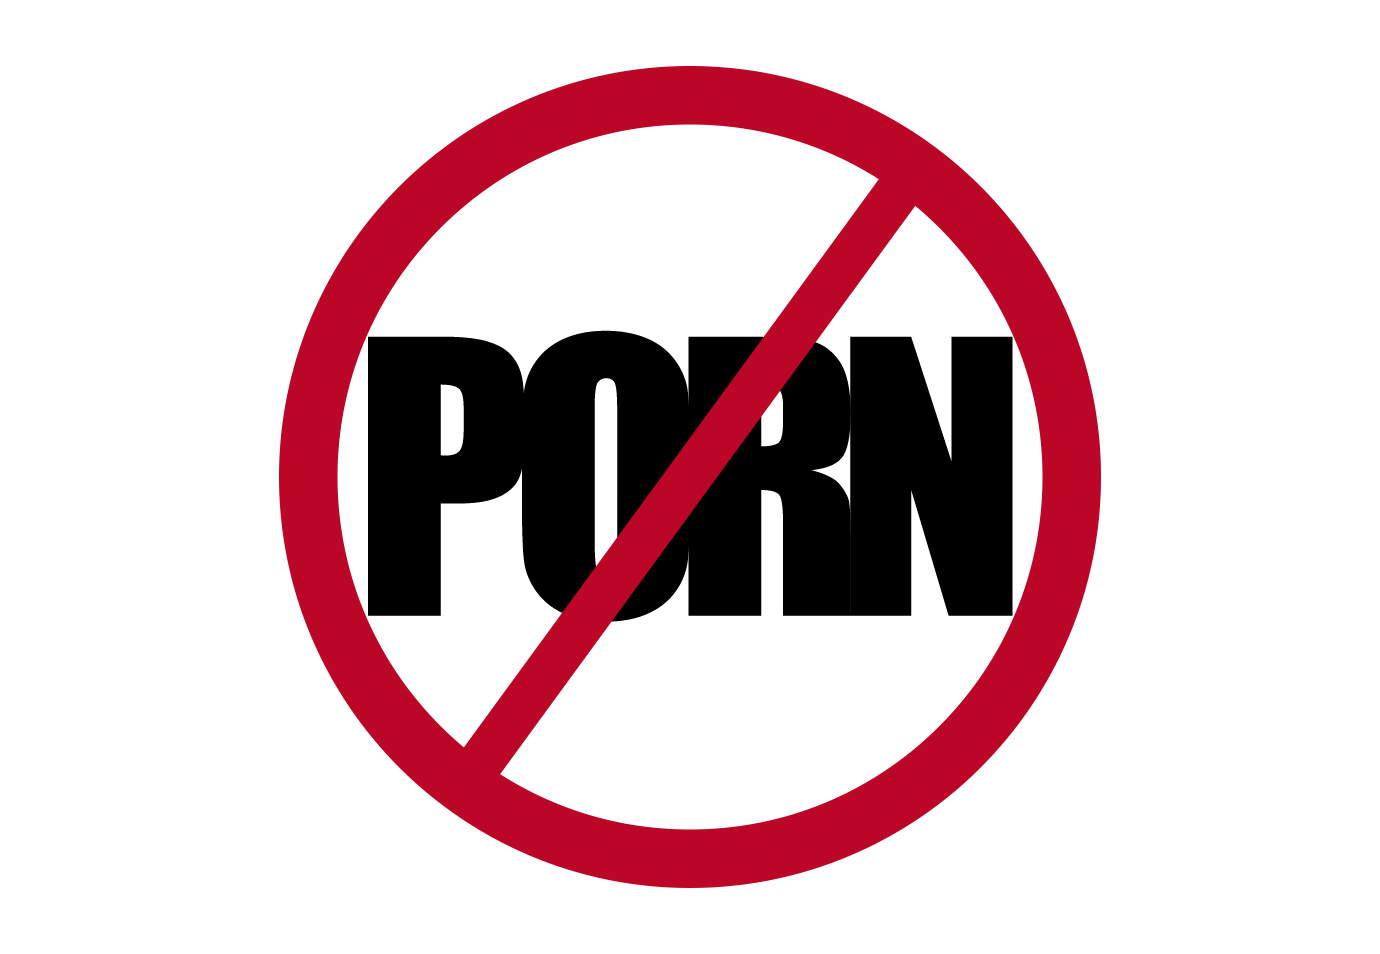 Anti Porn Tueagles croft download: download tueagles anti-porn 25.9.7.1 + ativação